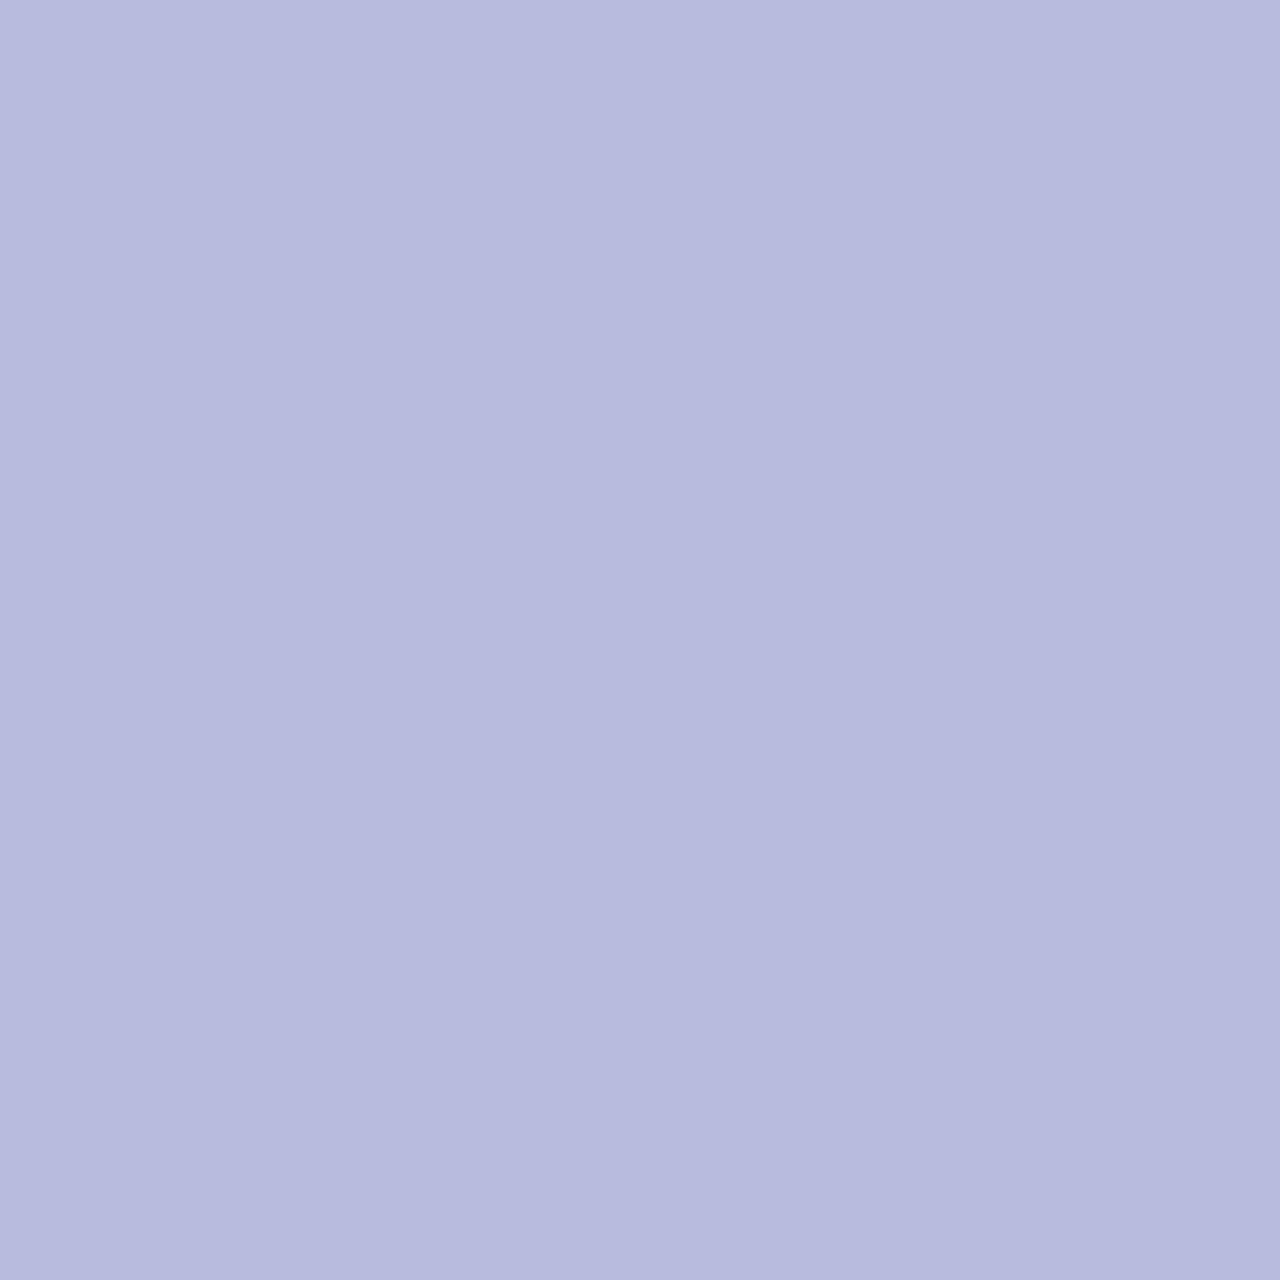 Rosco Calcolor Sheet #4215: 15 Blue, Gels